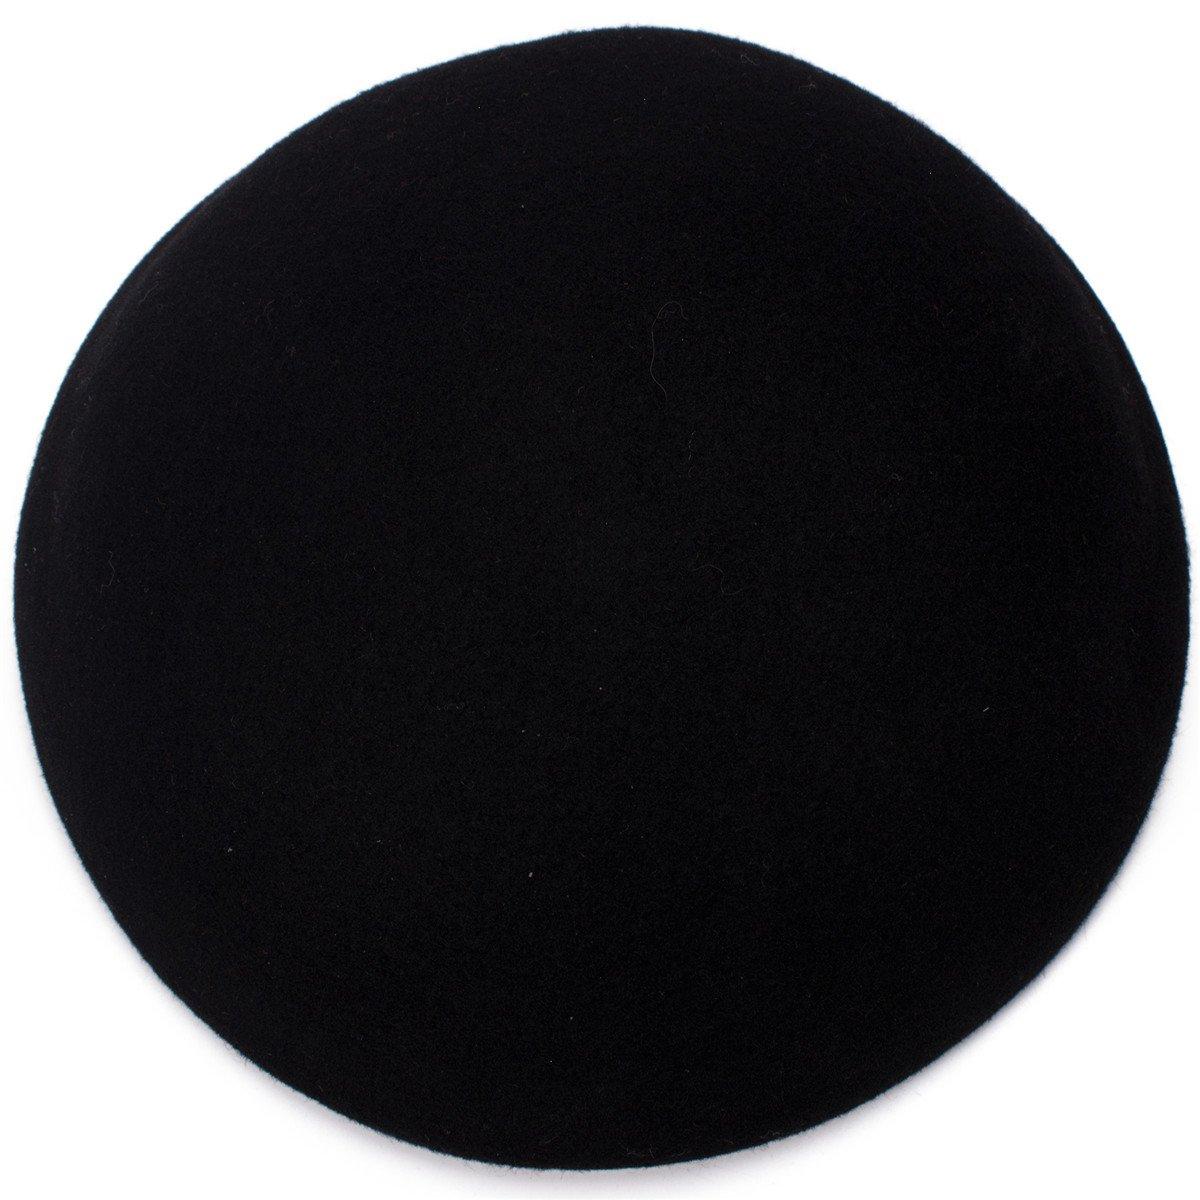 Lawliet Cute Wool Felt Pillbox Hat millinery Teardrop Fascinator Base Craft Supply (Black)